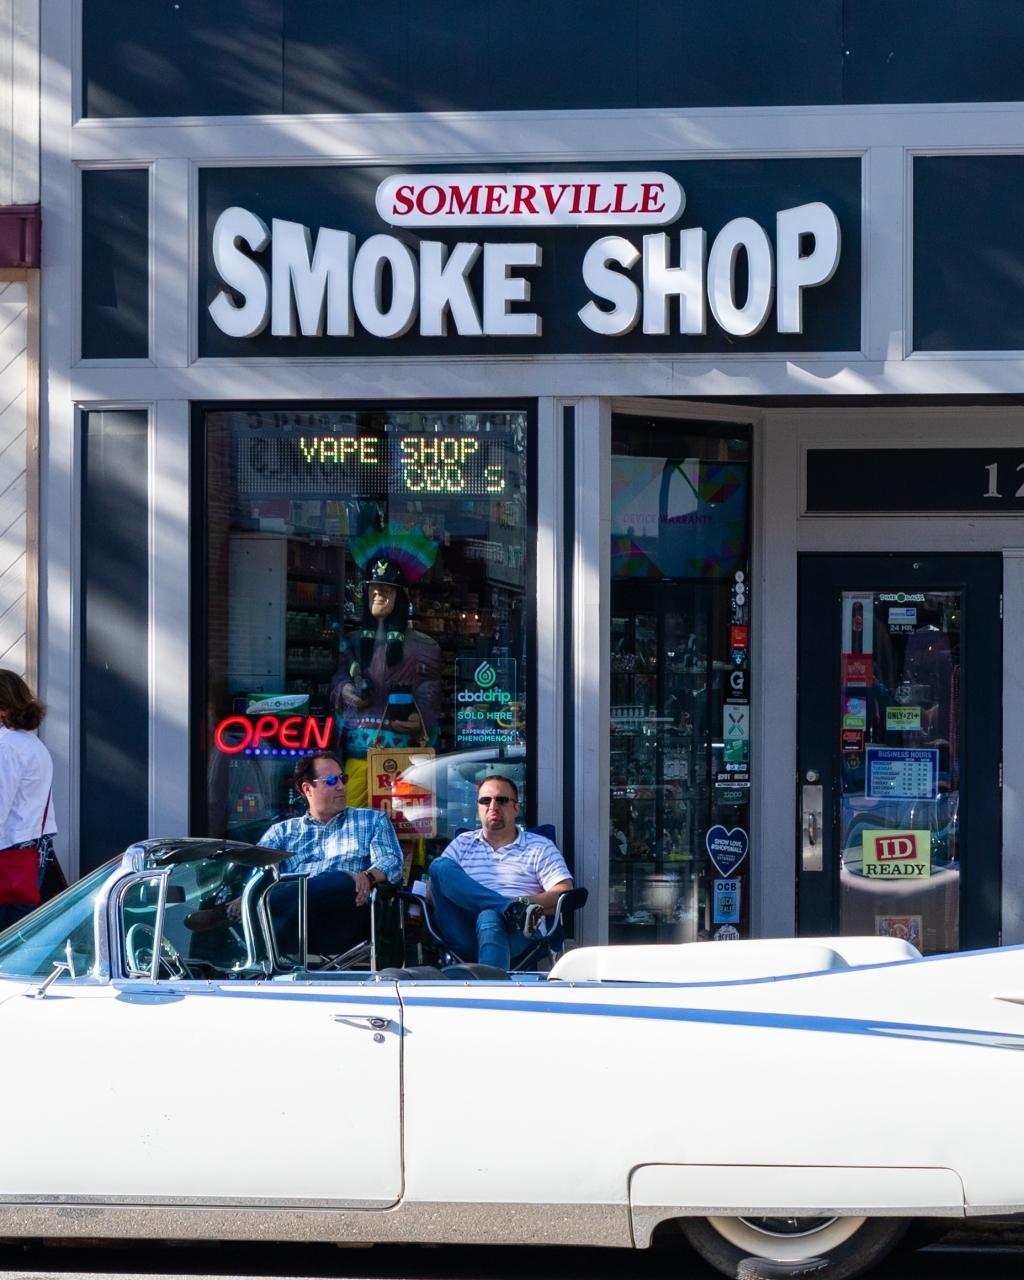 smokeshop-somerville-nj